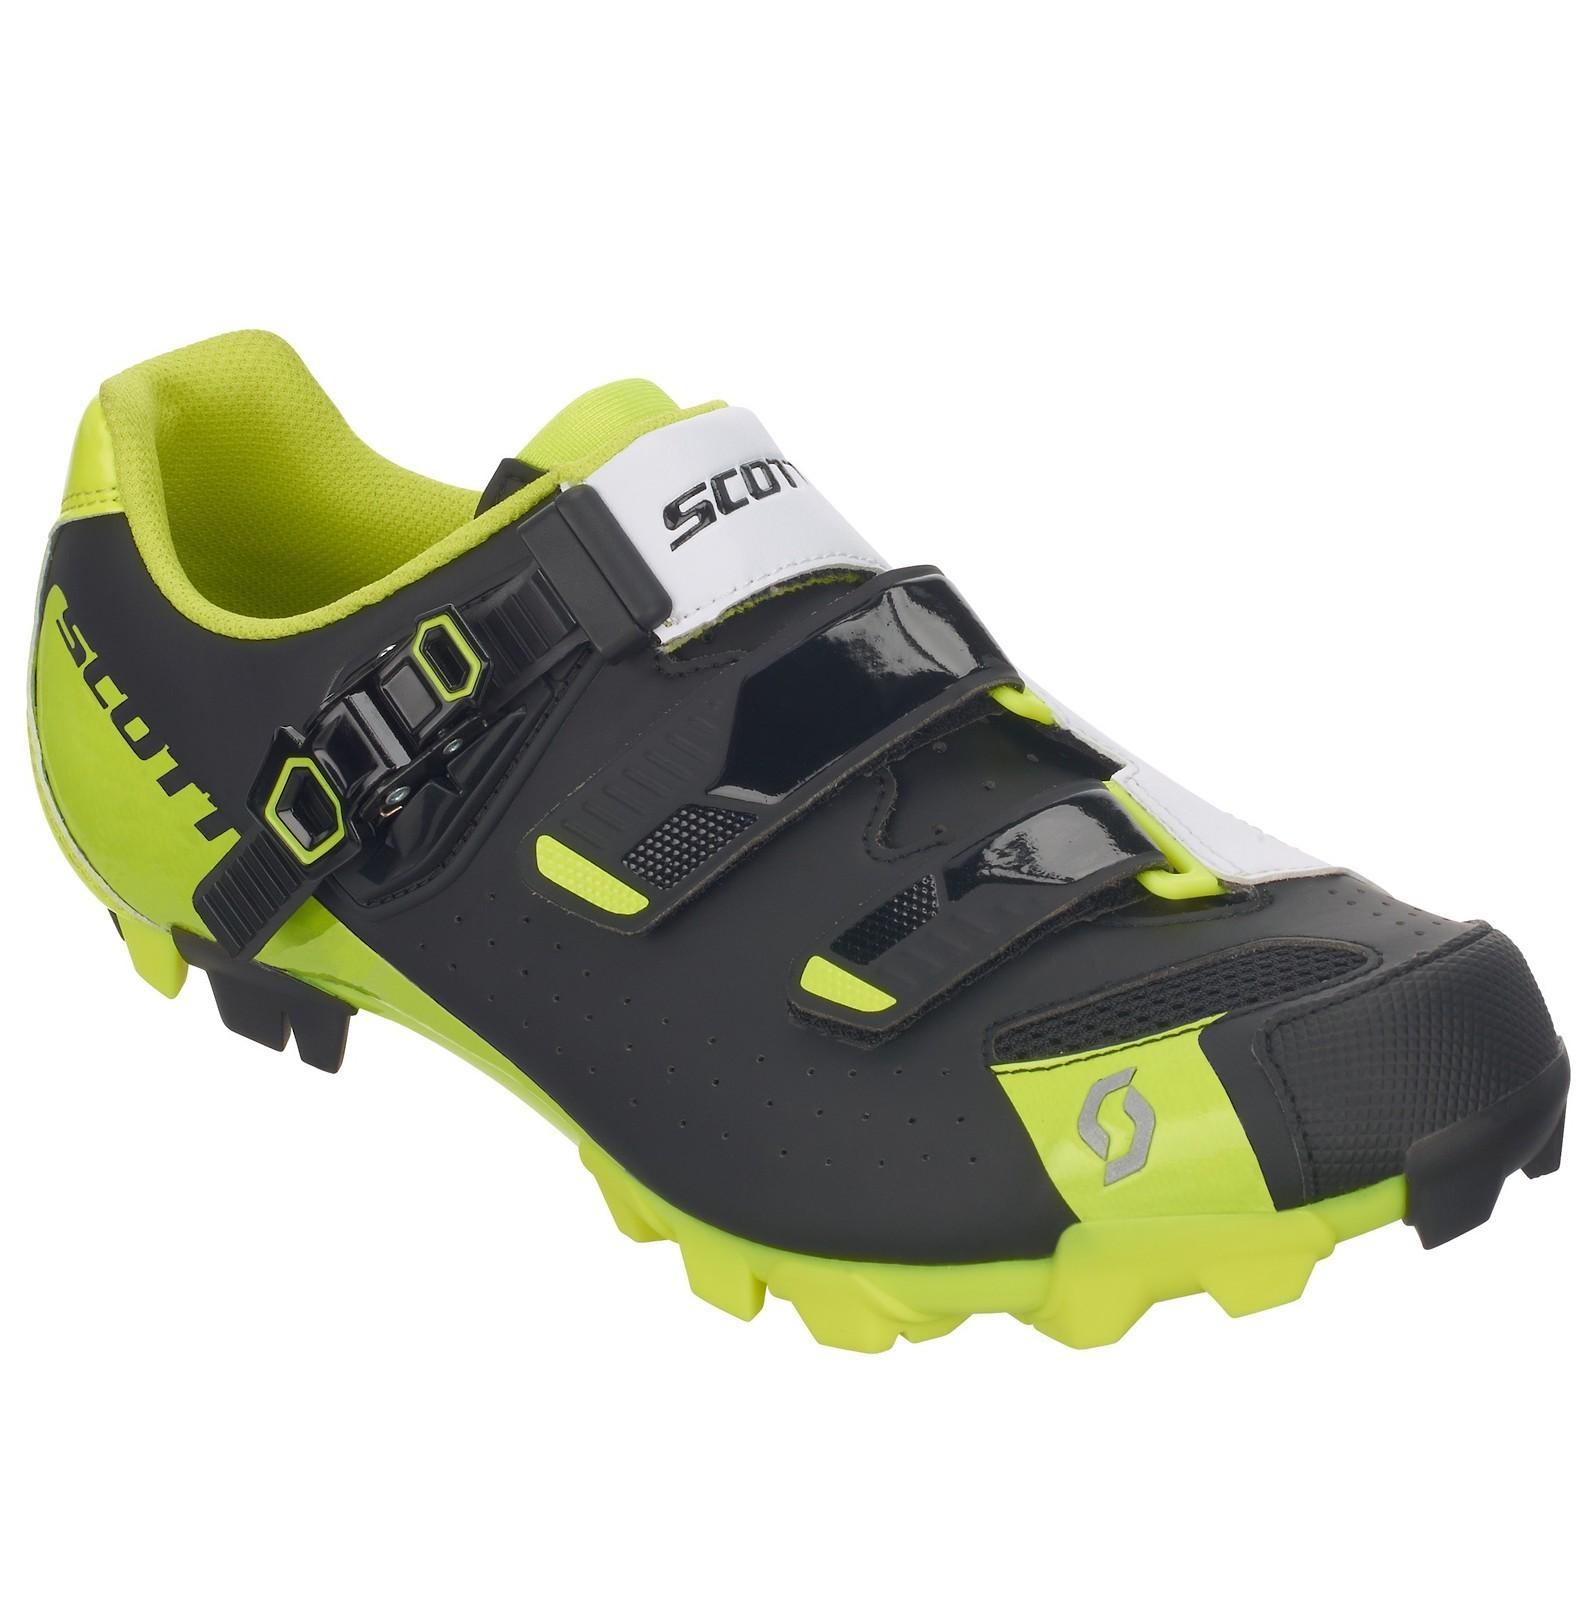 Scott Pro shoe in matte black/gloss yellow